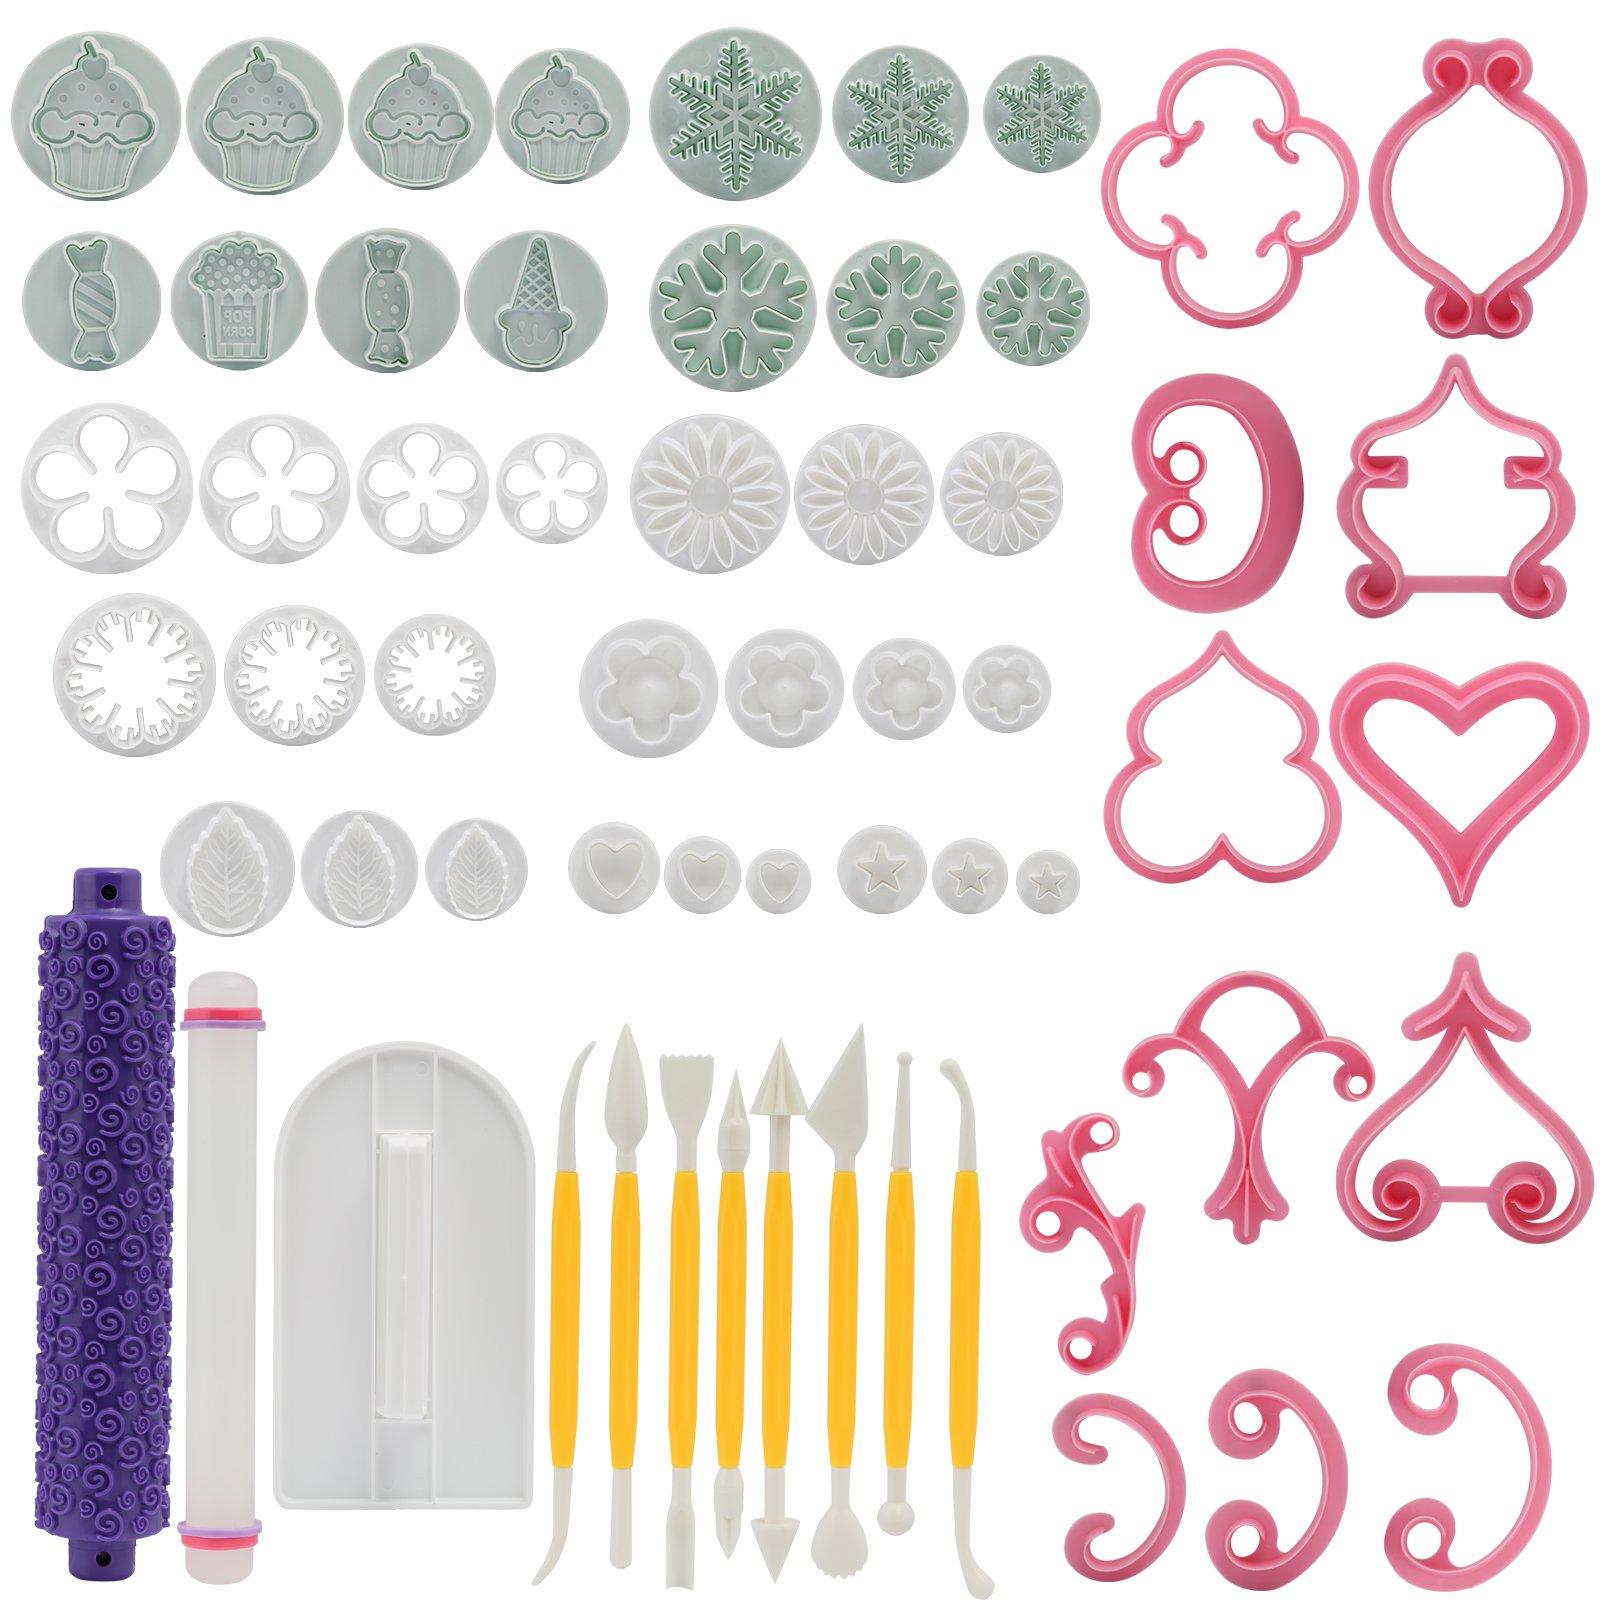 60 Piece Cake Decorating Tools, Fondant Cake Cutters Molds Modelling Tool Set